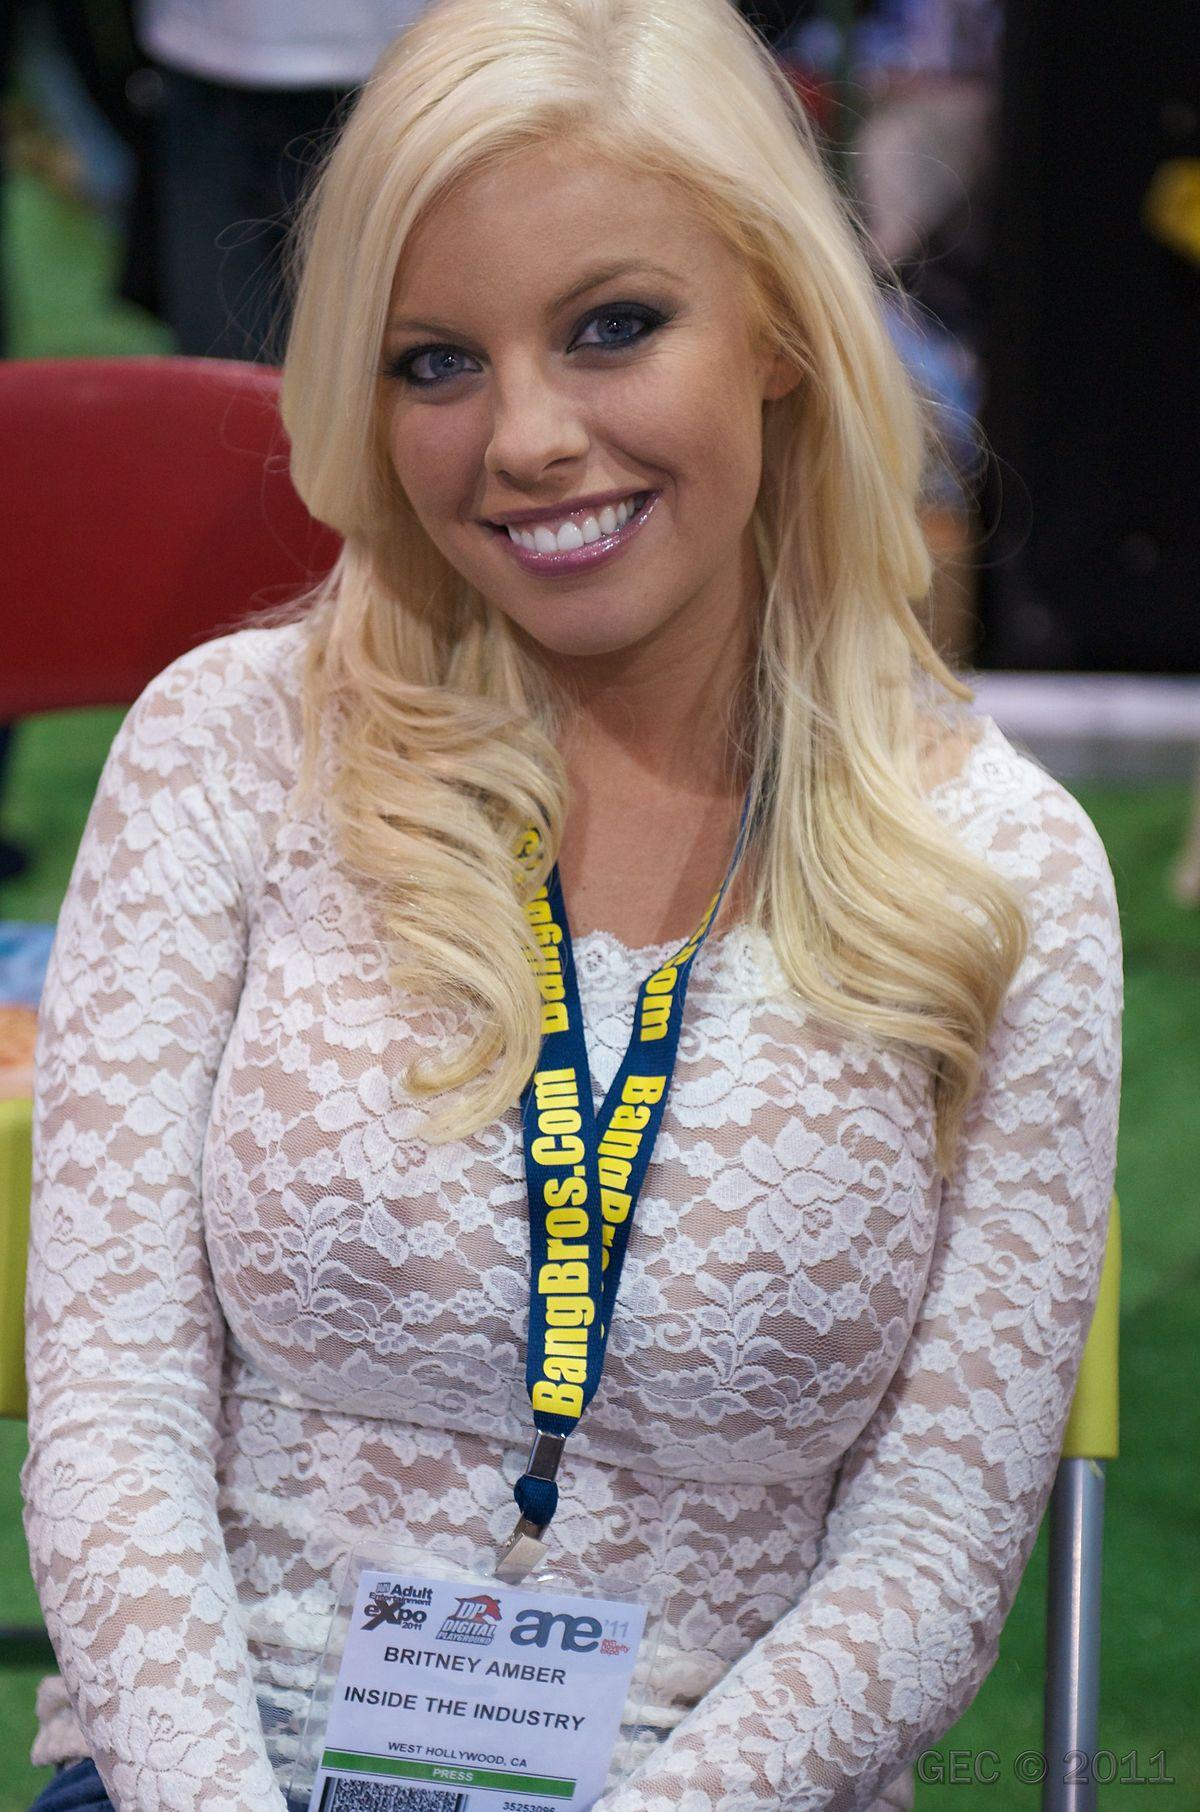 Brittany Amber